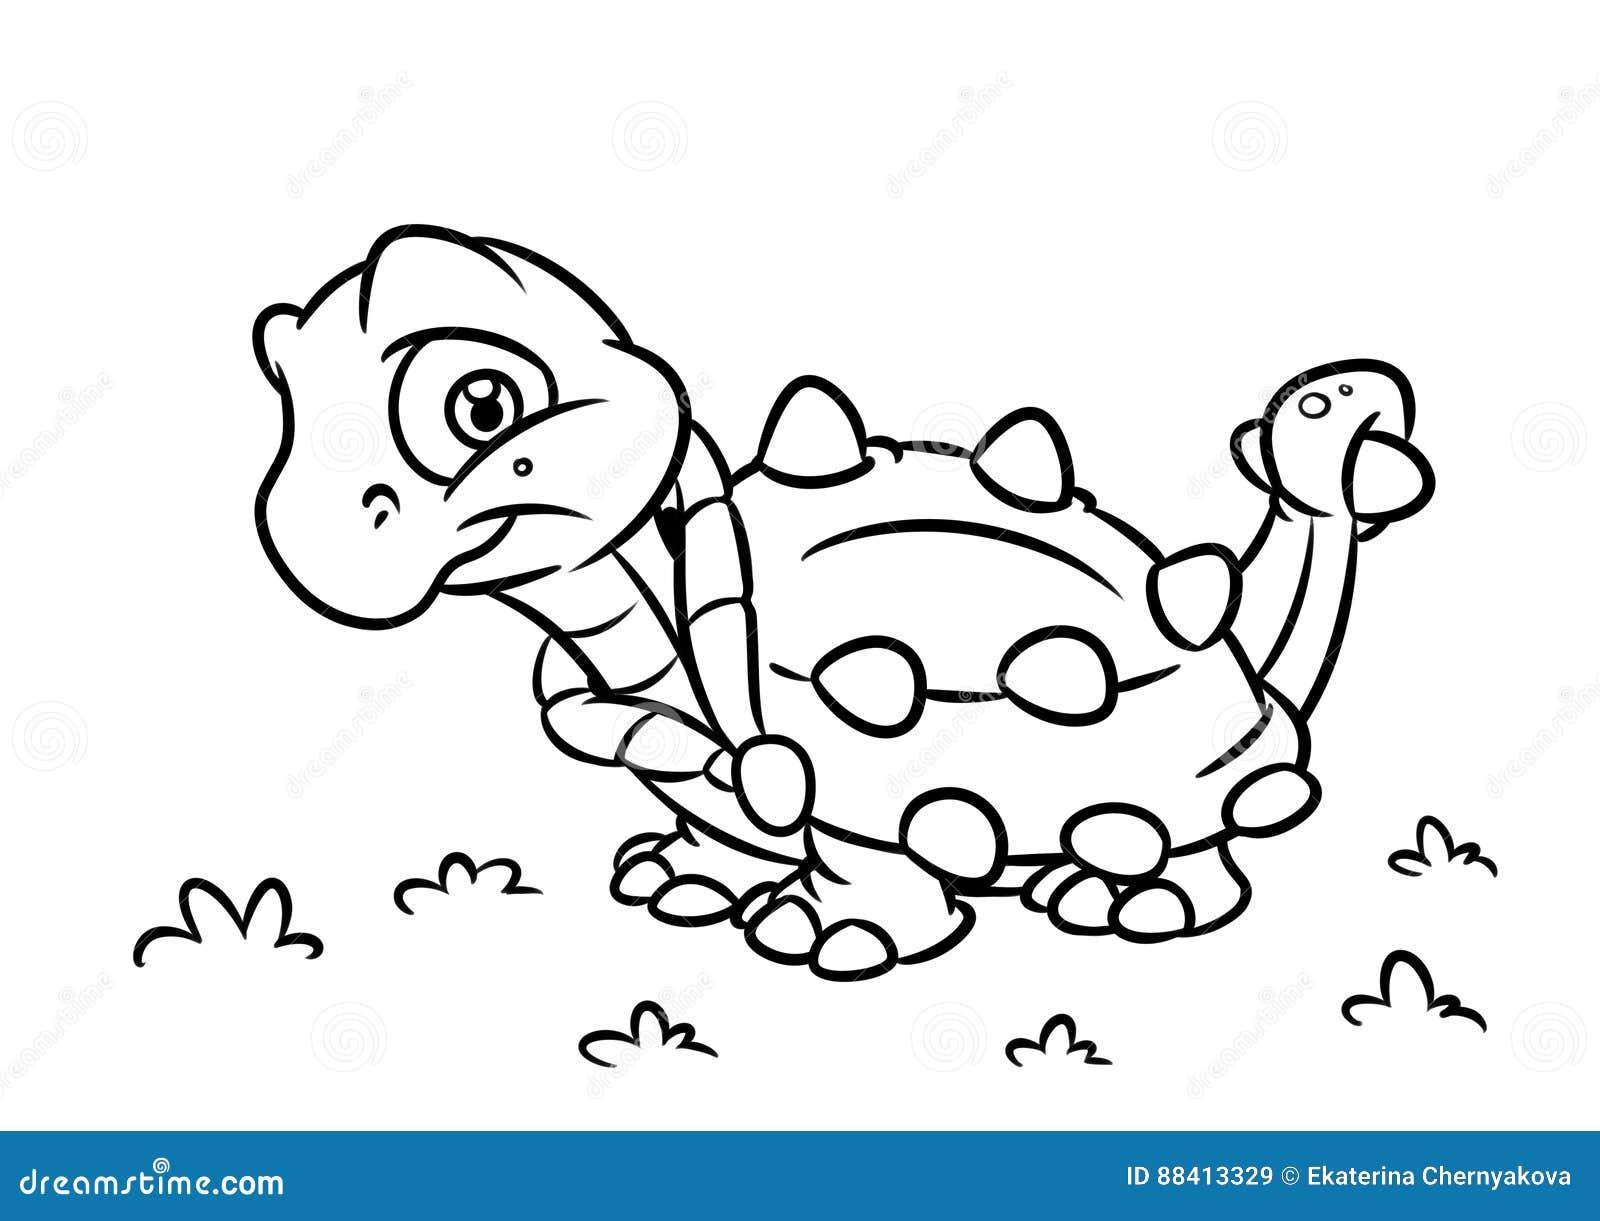 Dinosaur Ankylosaurus Coloring Page Cartoon Illustrations Stock ...